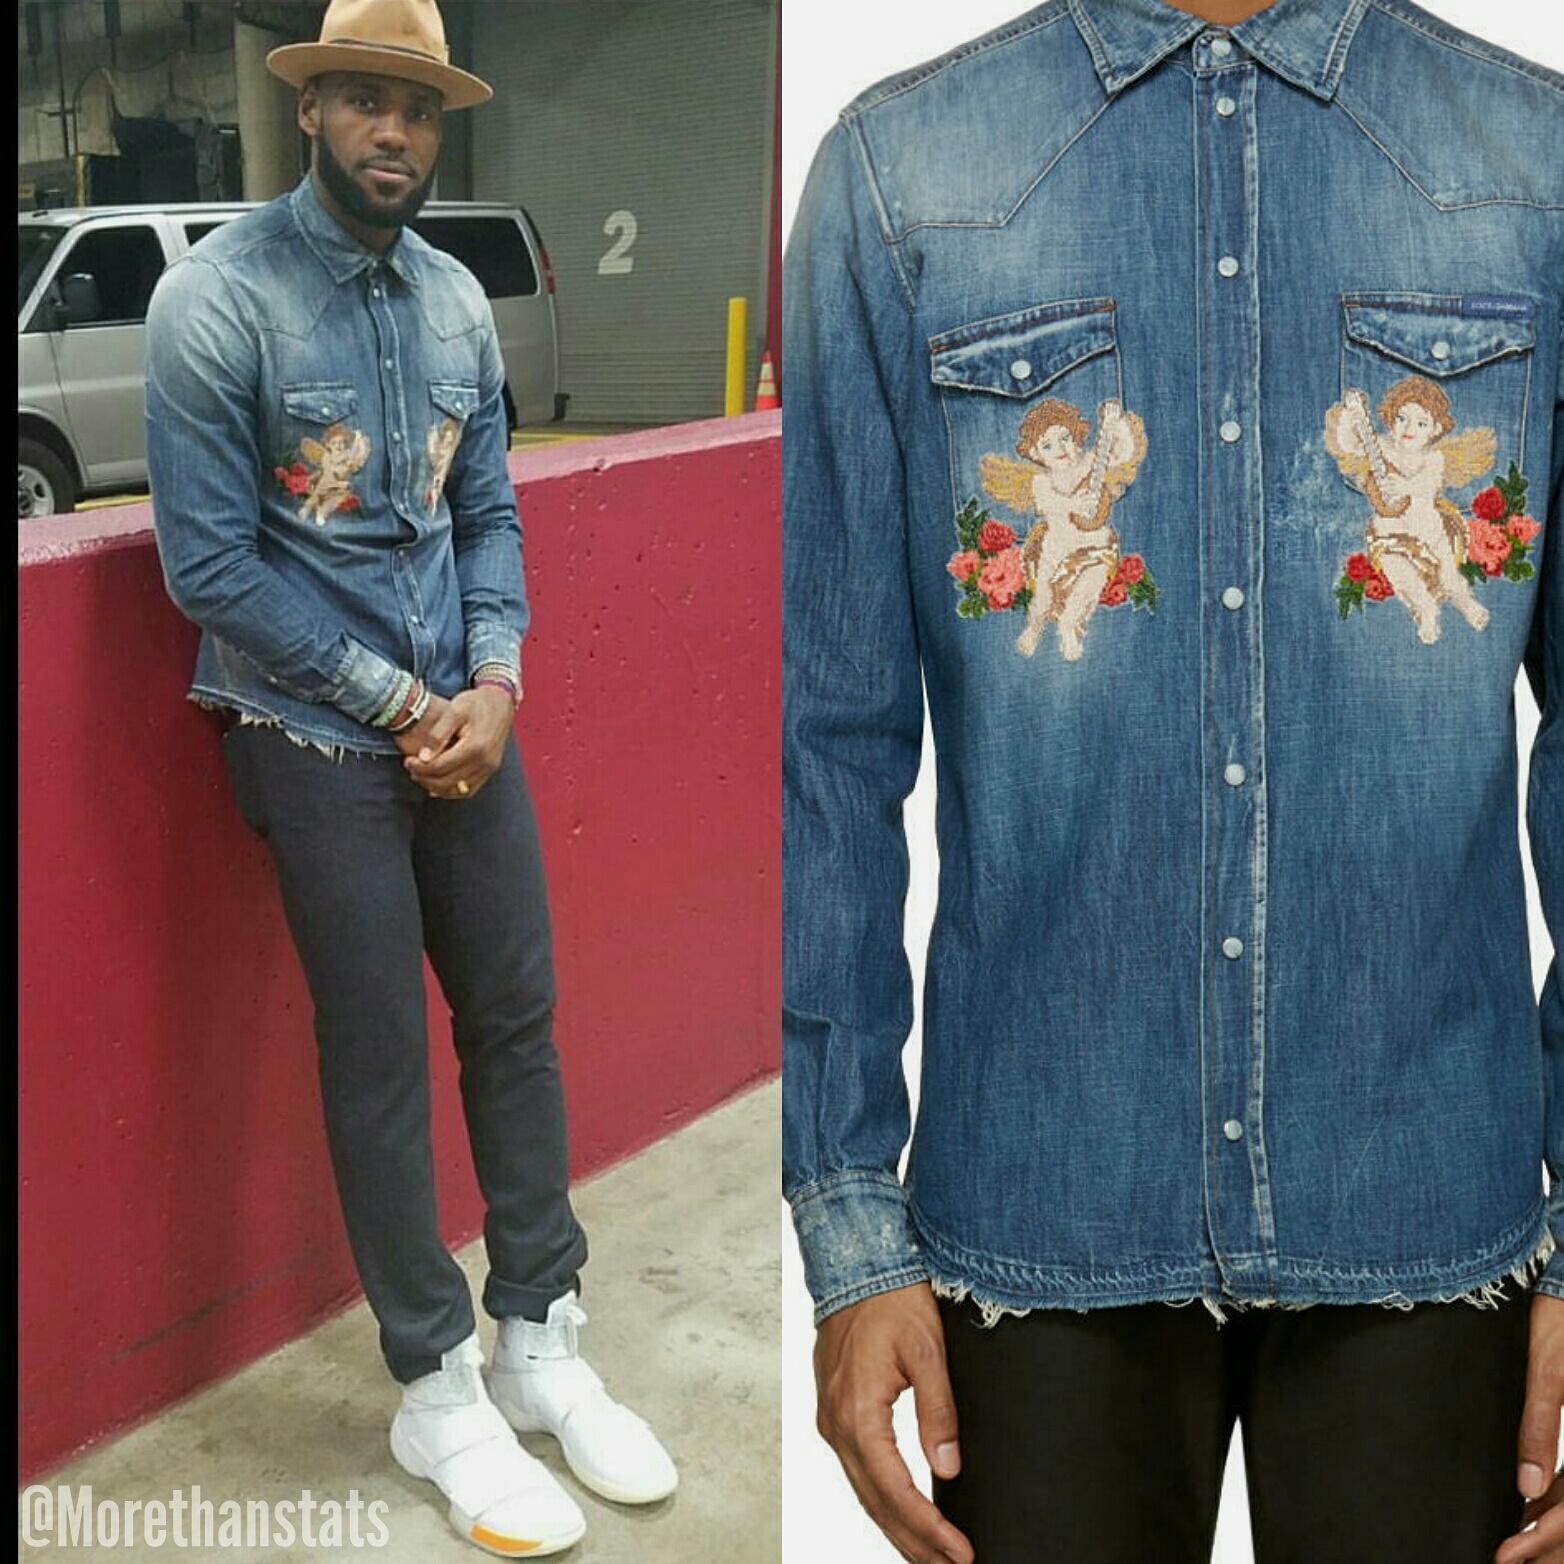 STYLE: Lebron James' Instagram Dolce & Gabbana Mens Denim 'Cherub' Shirt And Lebron Solider x John Elliott Sneakers